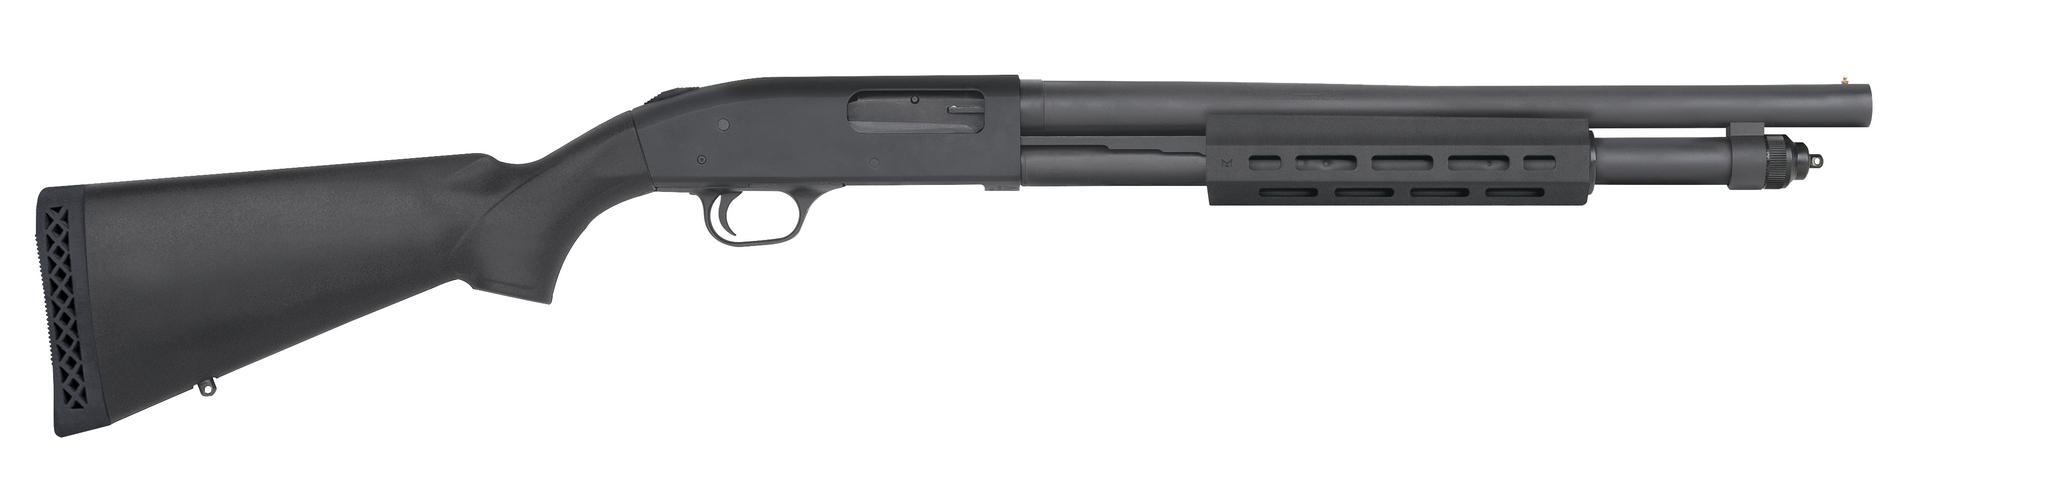 Mossberg 590A1 Milspec 12 Gauge